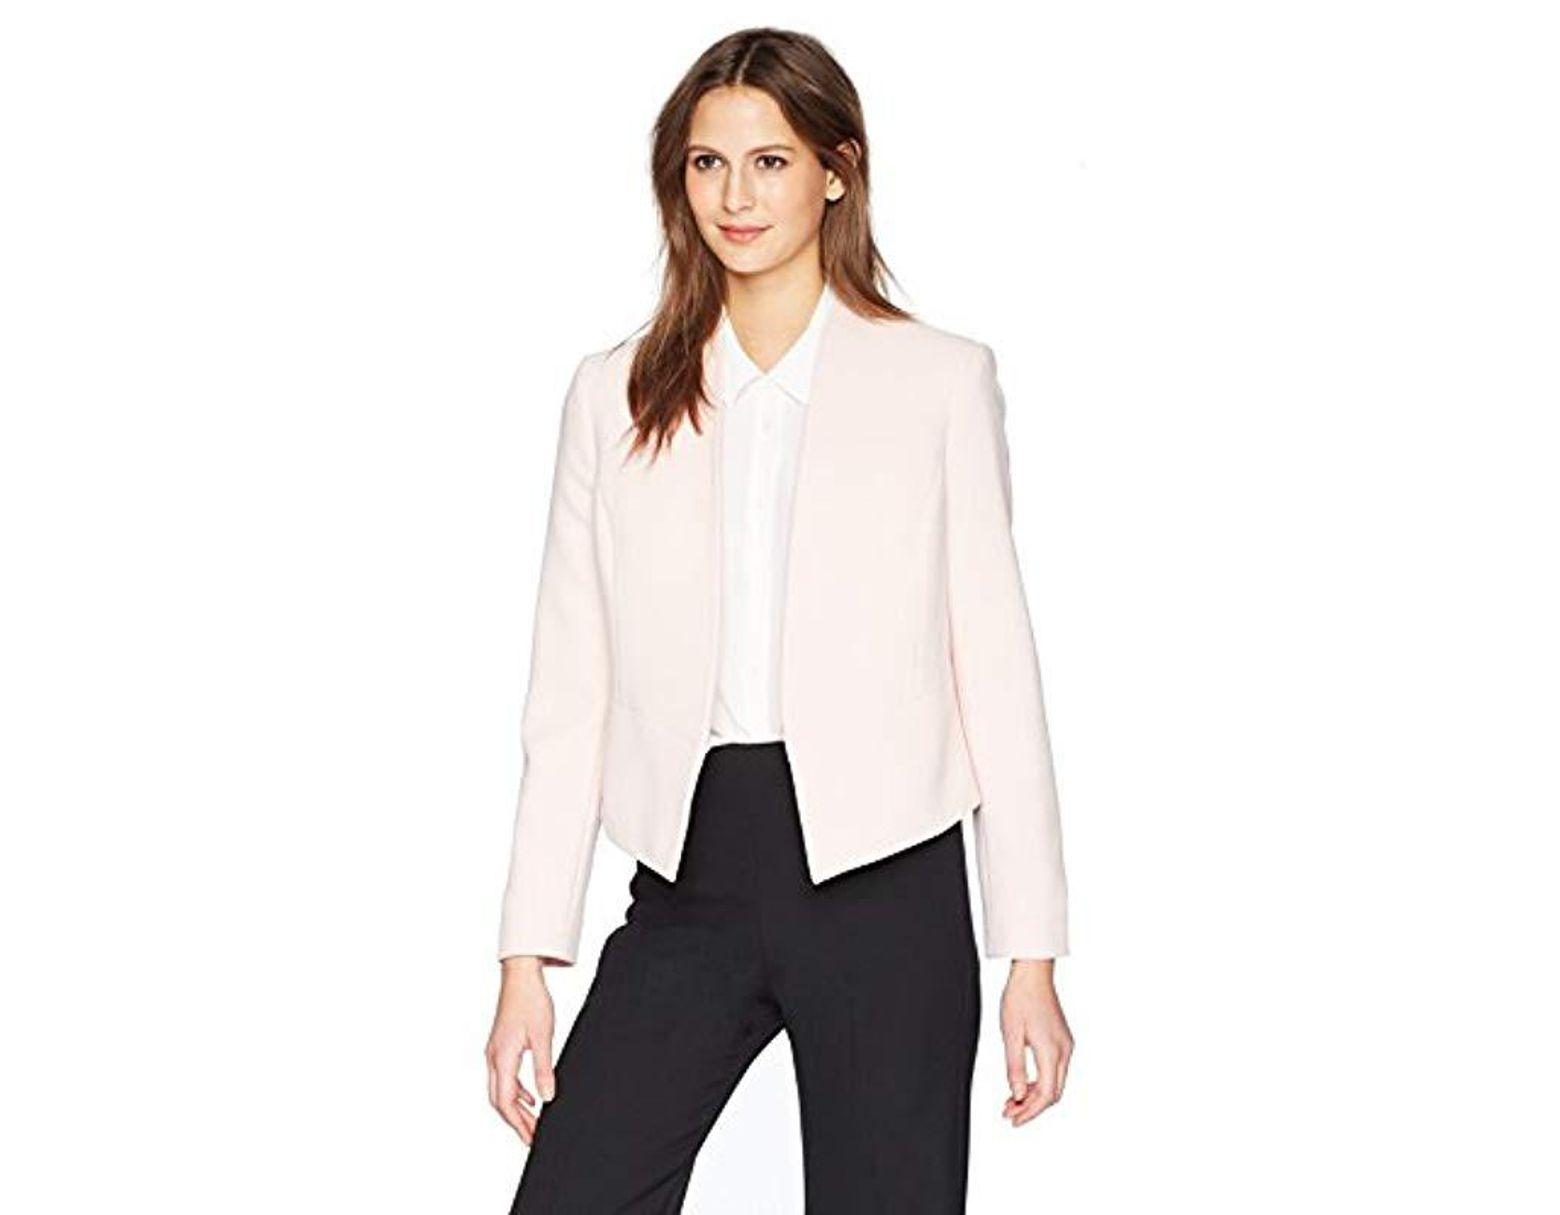 a39d4614dca Nine West Bi Stretch Open Shawl Collar Jacket in White - Lyst